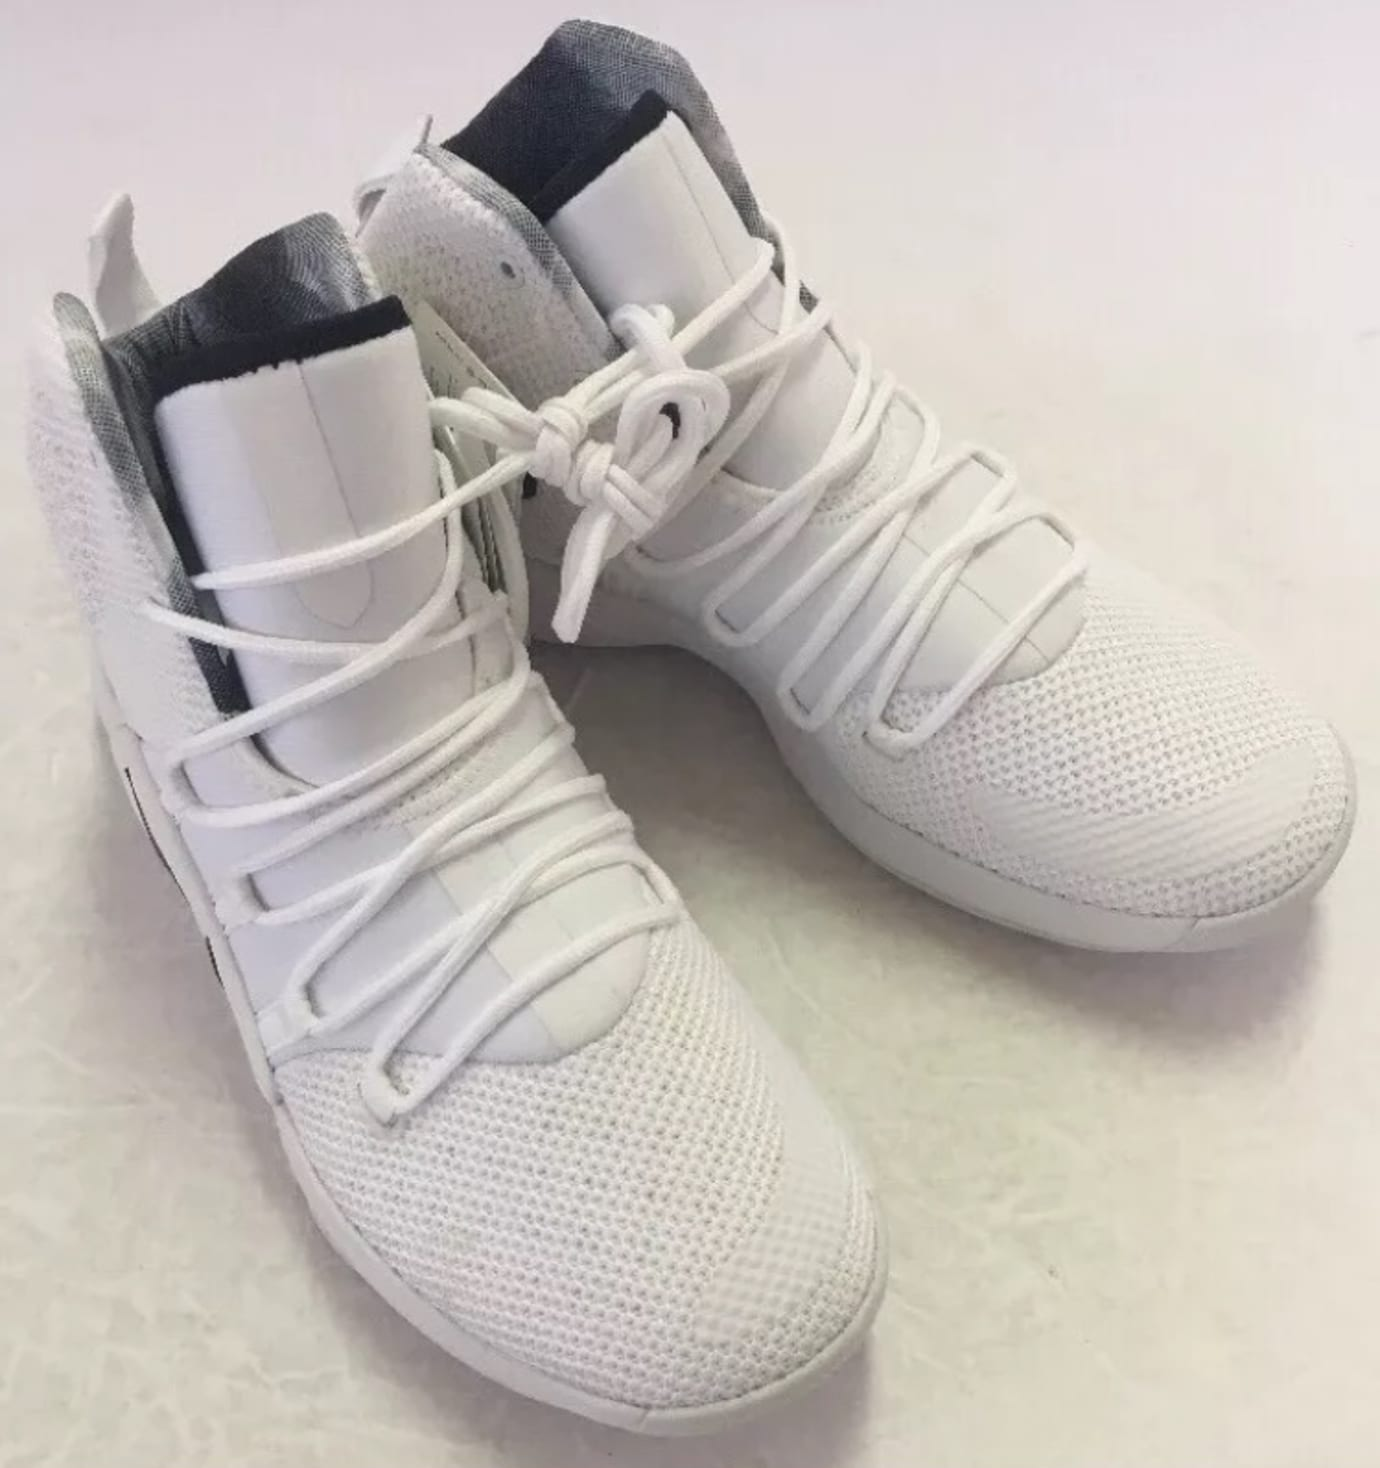 06a152ff1352 Nike Hyperdunk 2018 TB White Black AR0467-100 Right